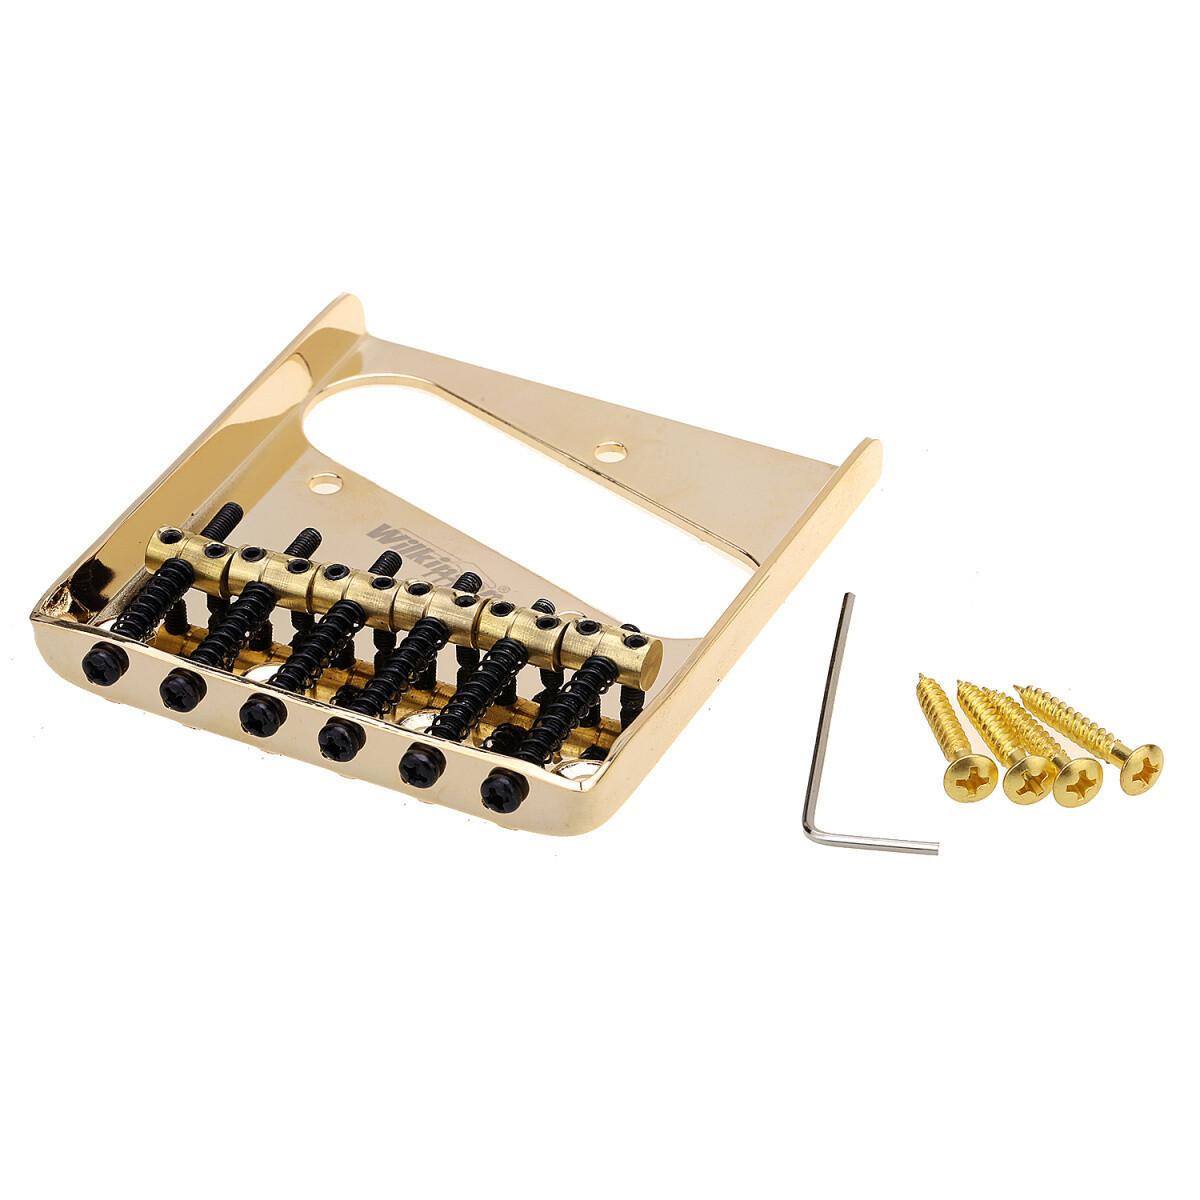 Wilkinson 54mm(2-1/8 inch) String Spacing Vintage Ashtray Telecaster Bridge 6 Brass Saddles Gold